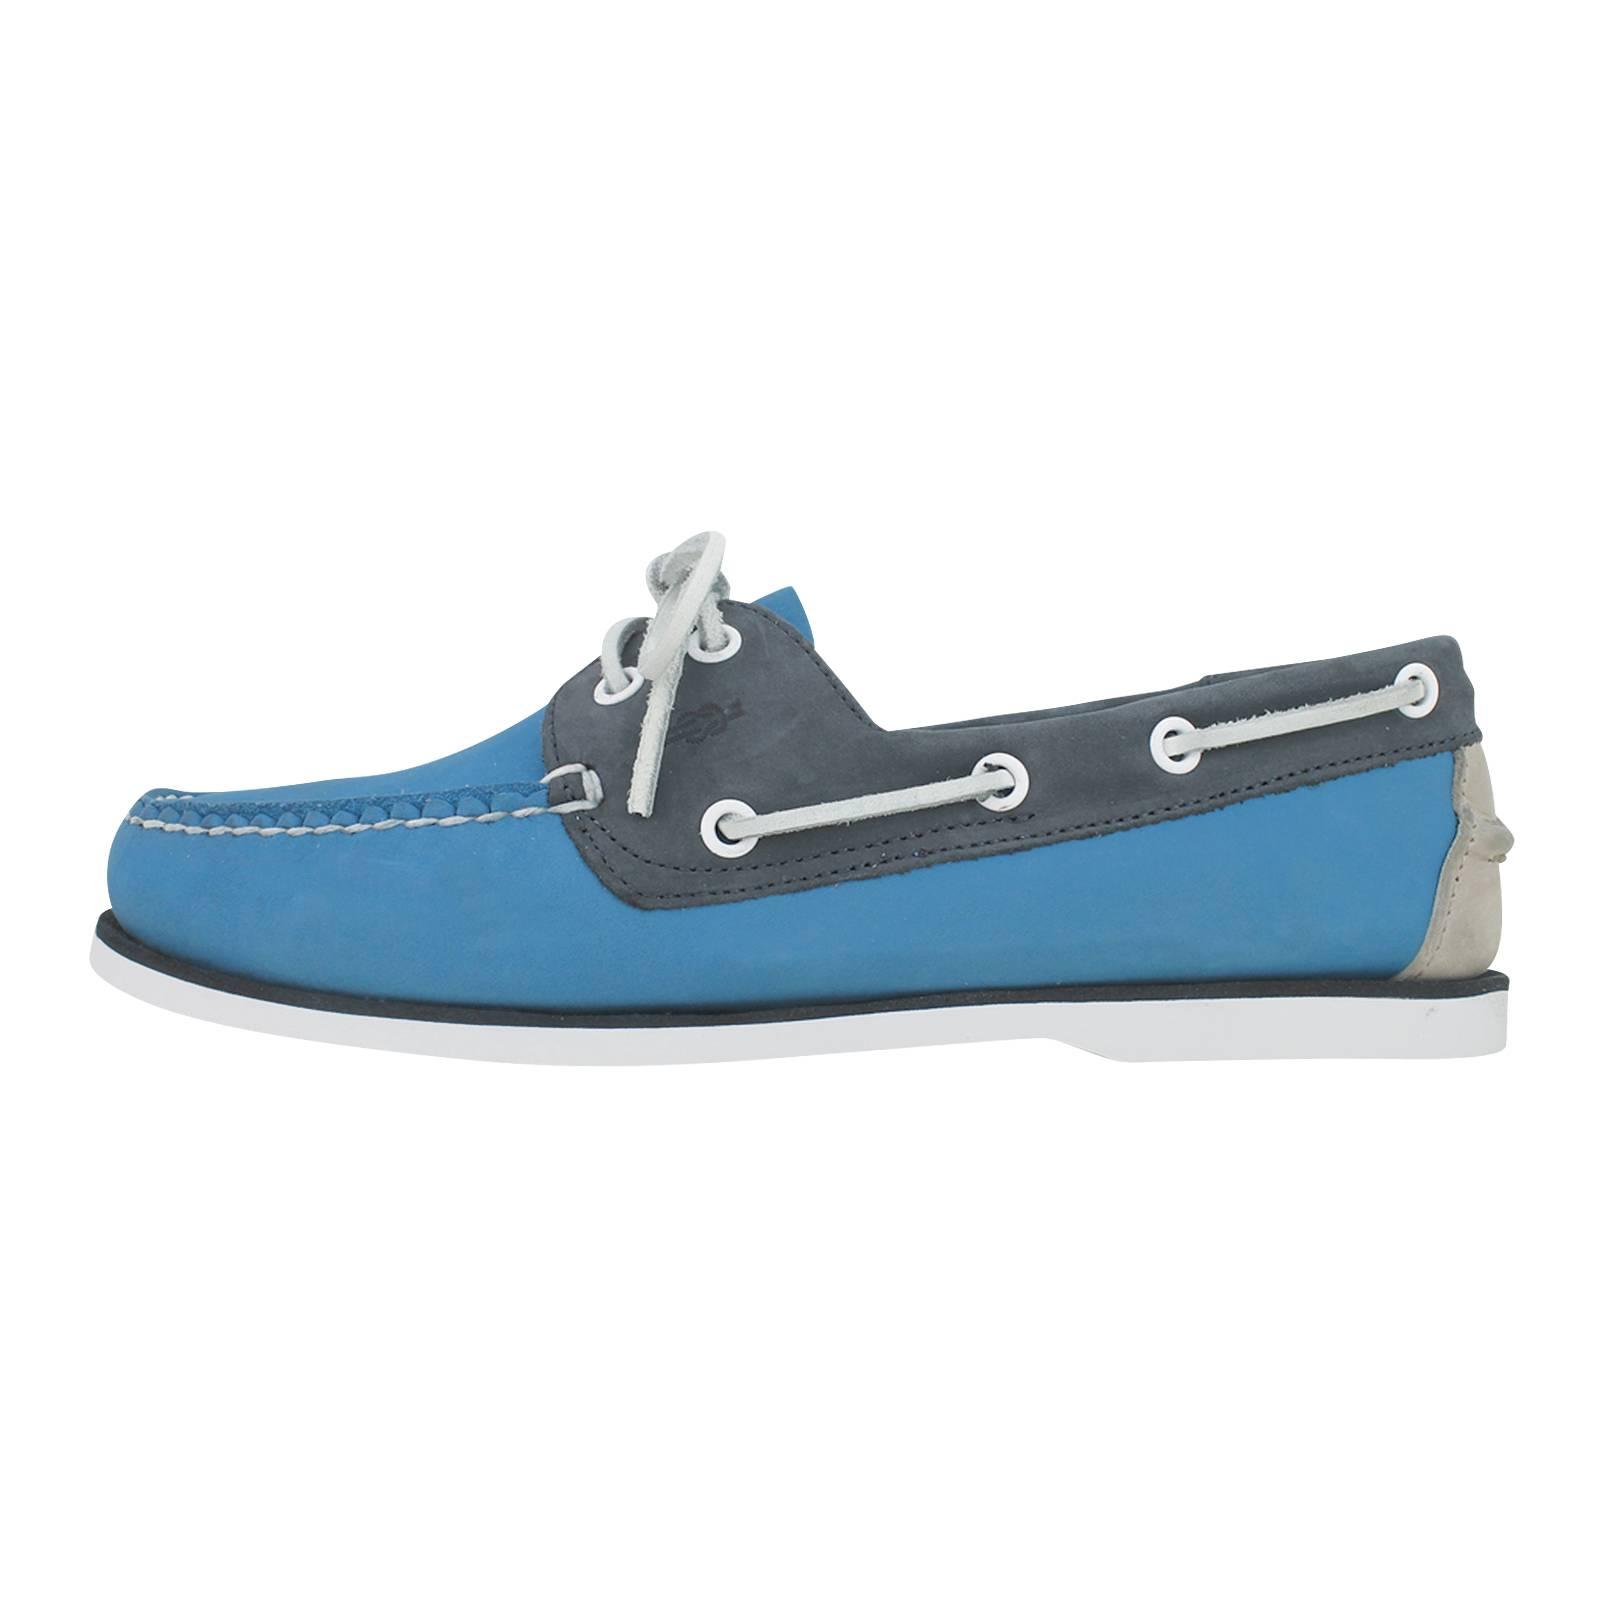 Belk Chicago Men s boat shoes made of nubuck Gianna Kazakou line